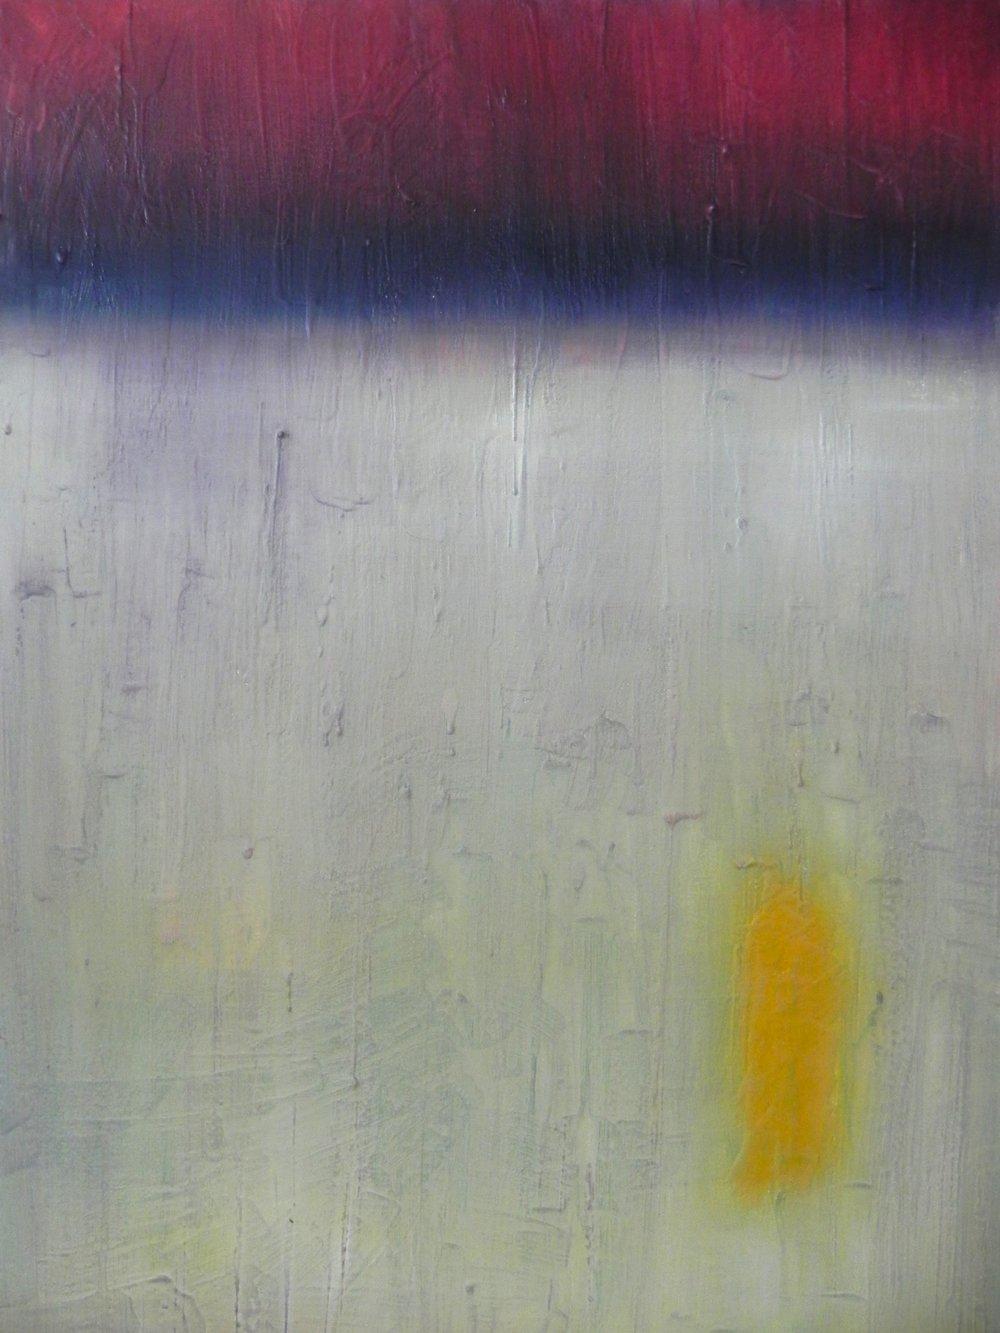 "NOISELESSNESS, 2014. 24"" x 18"". Cradled Wood Panel. Oil and Wax. Copyright © Karen Santos 2014."